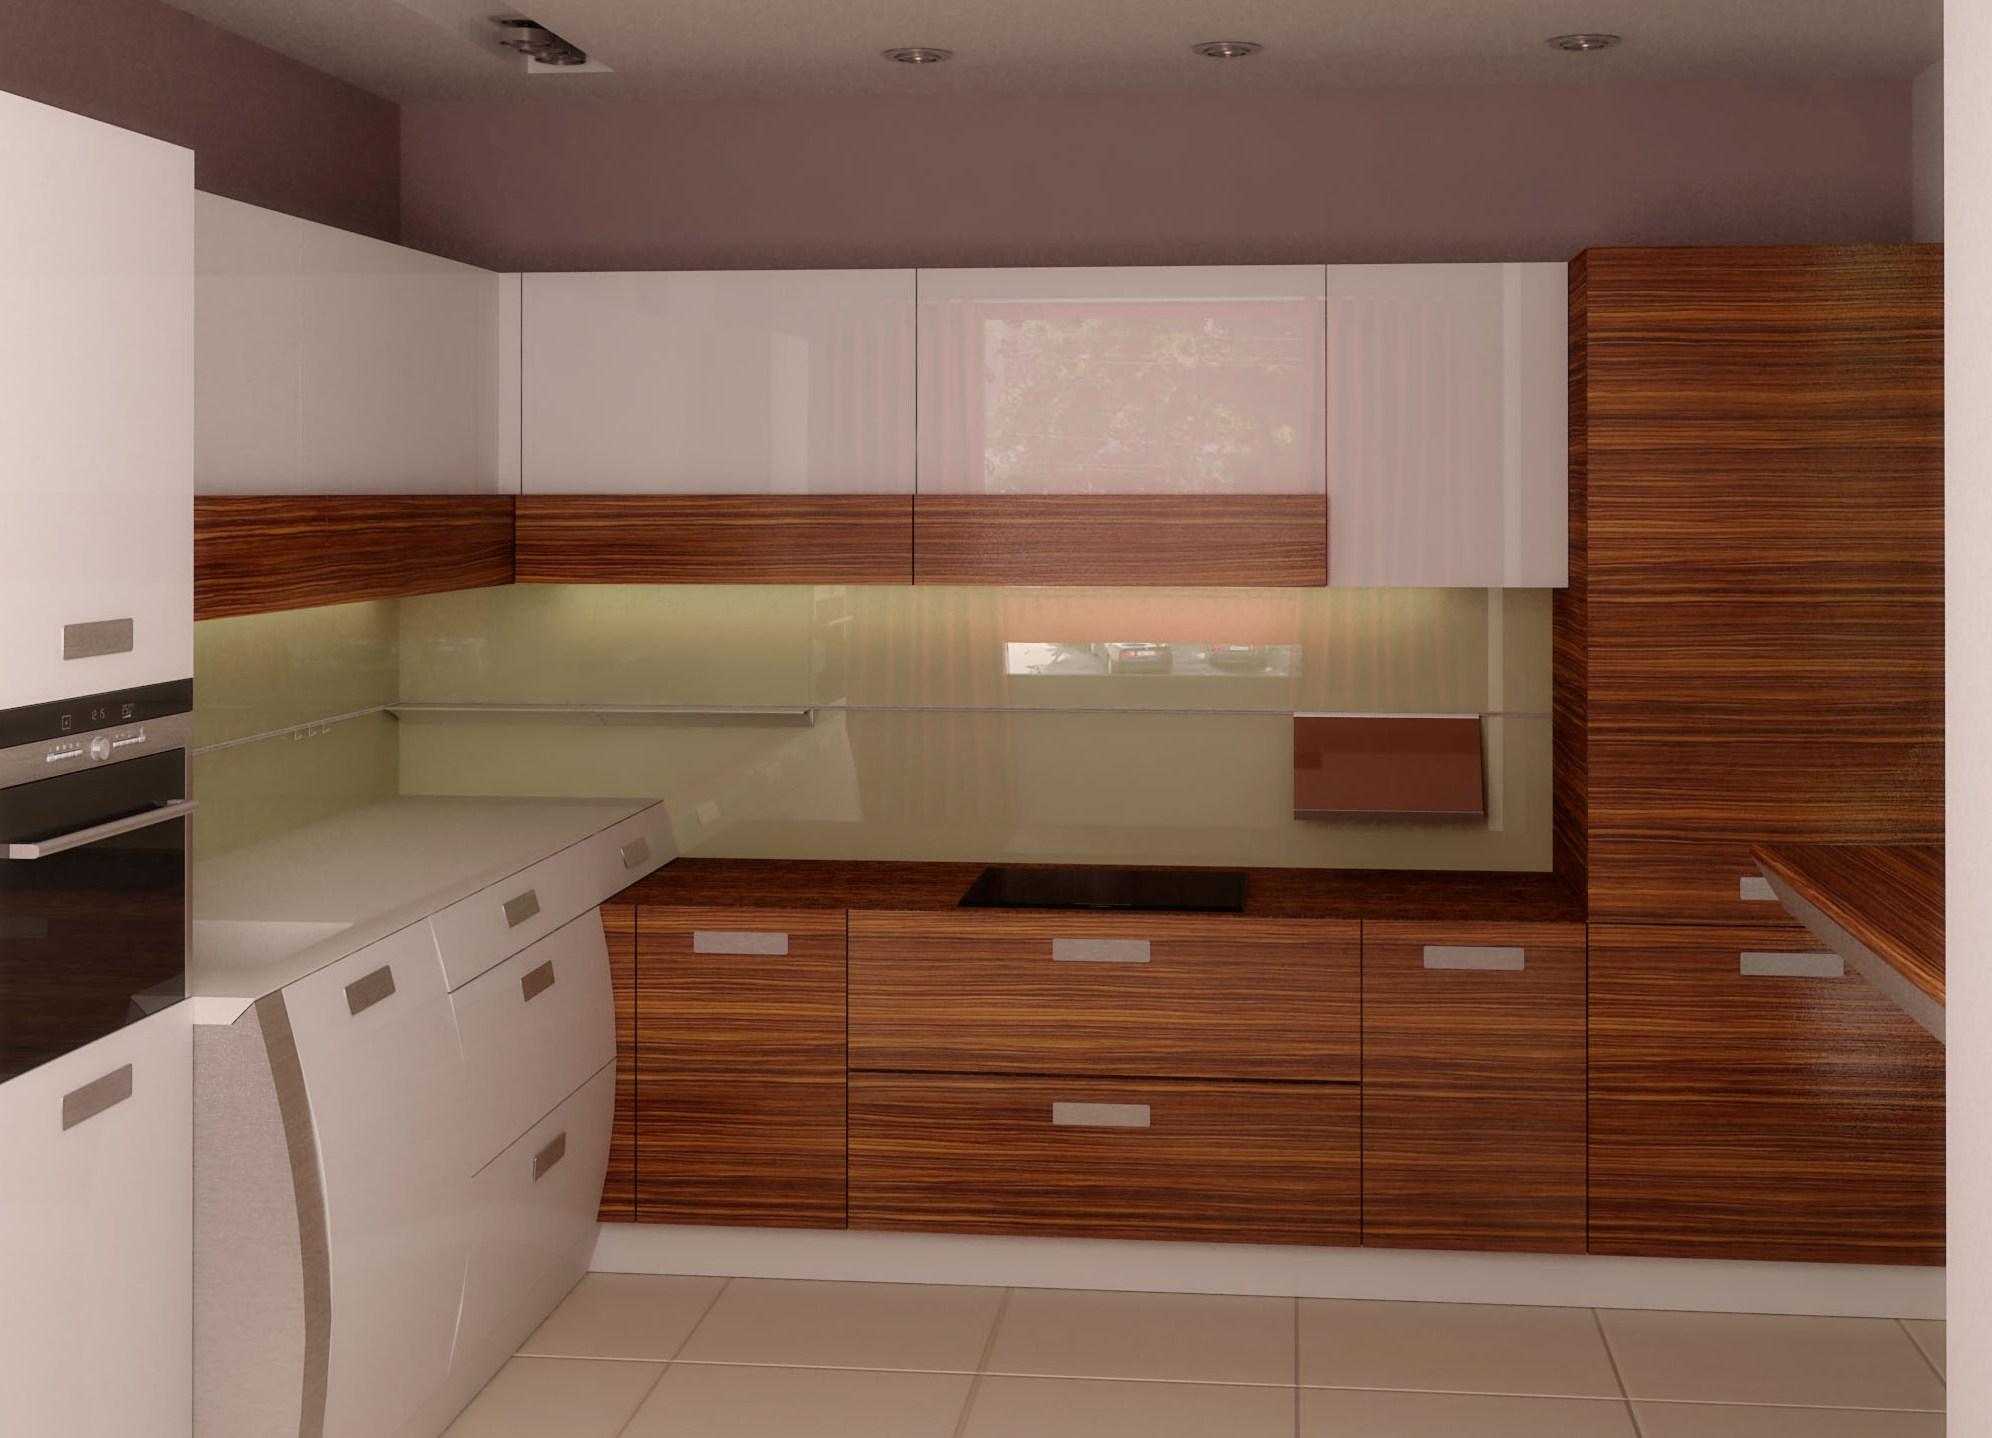 Какие кухни лучше из дерева или пластика